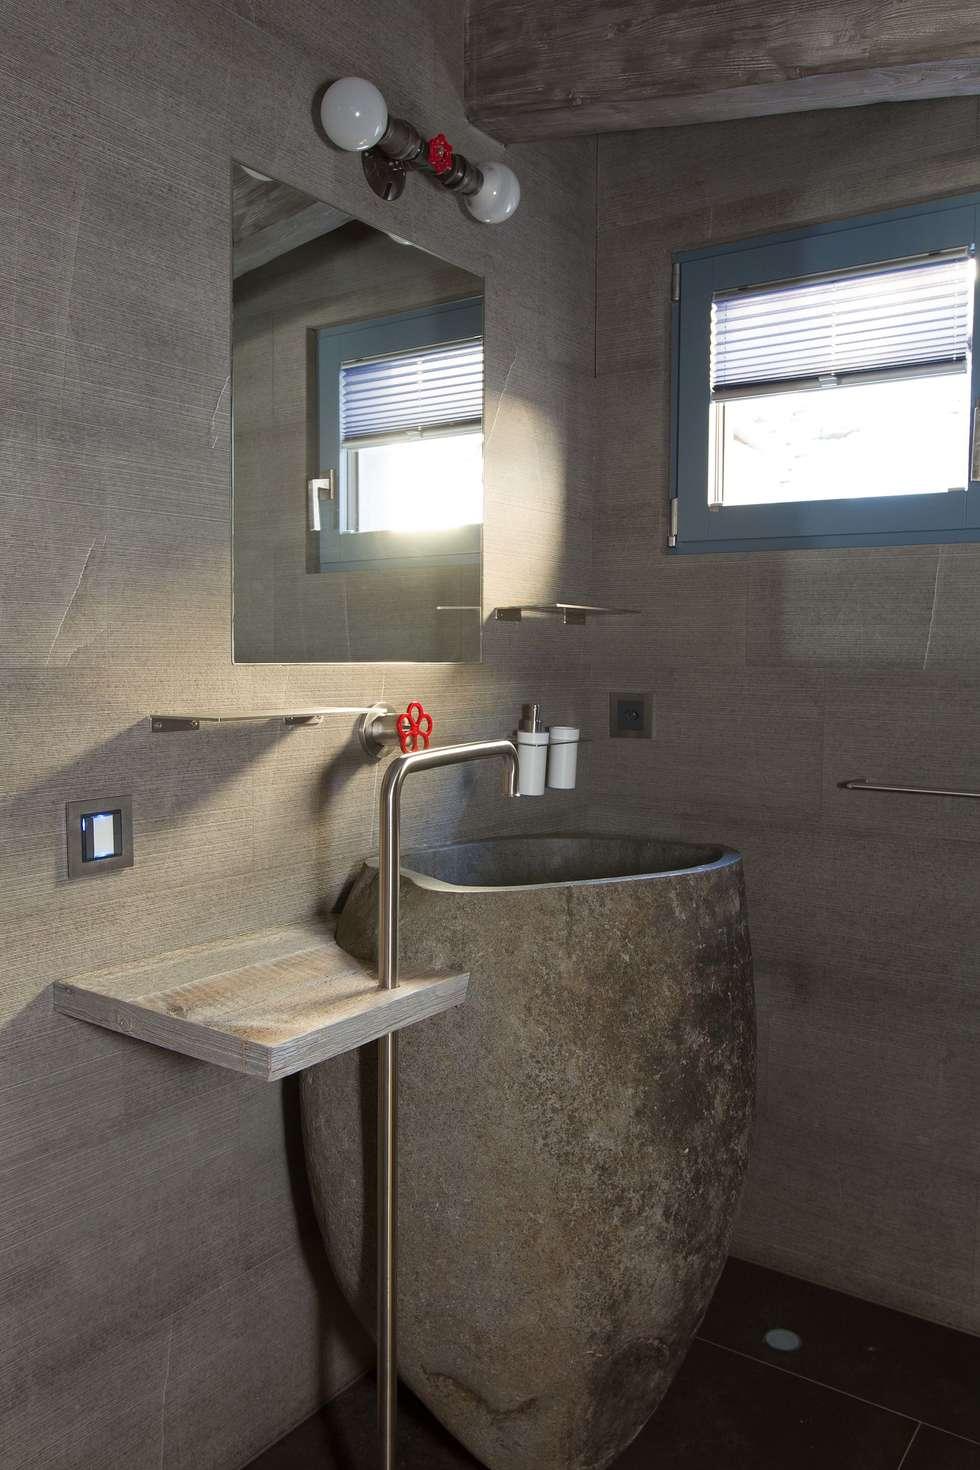 Bagno padronale: Bagno in stile in stile Moderno di DF Design